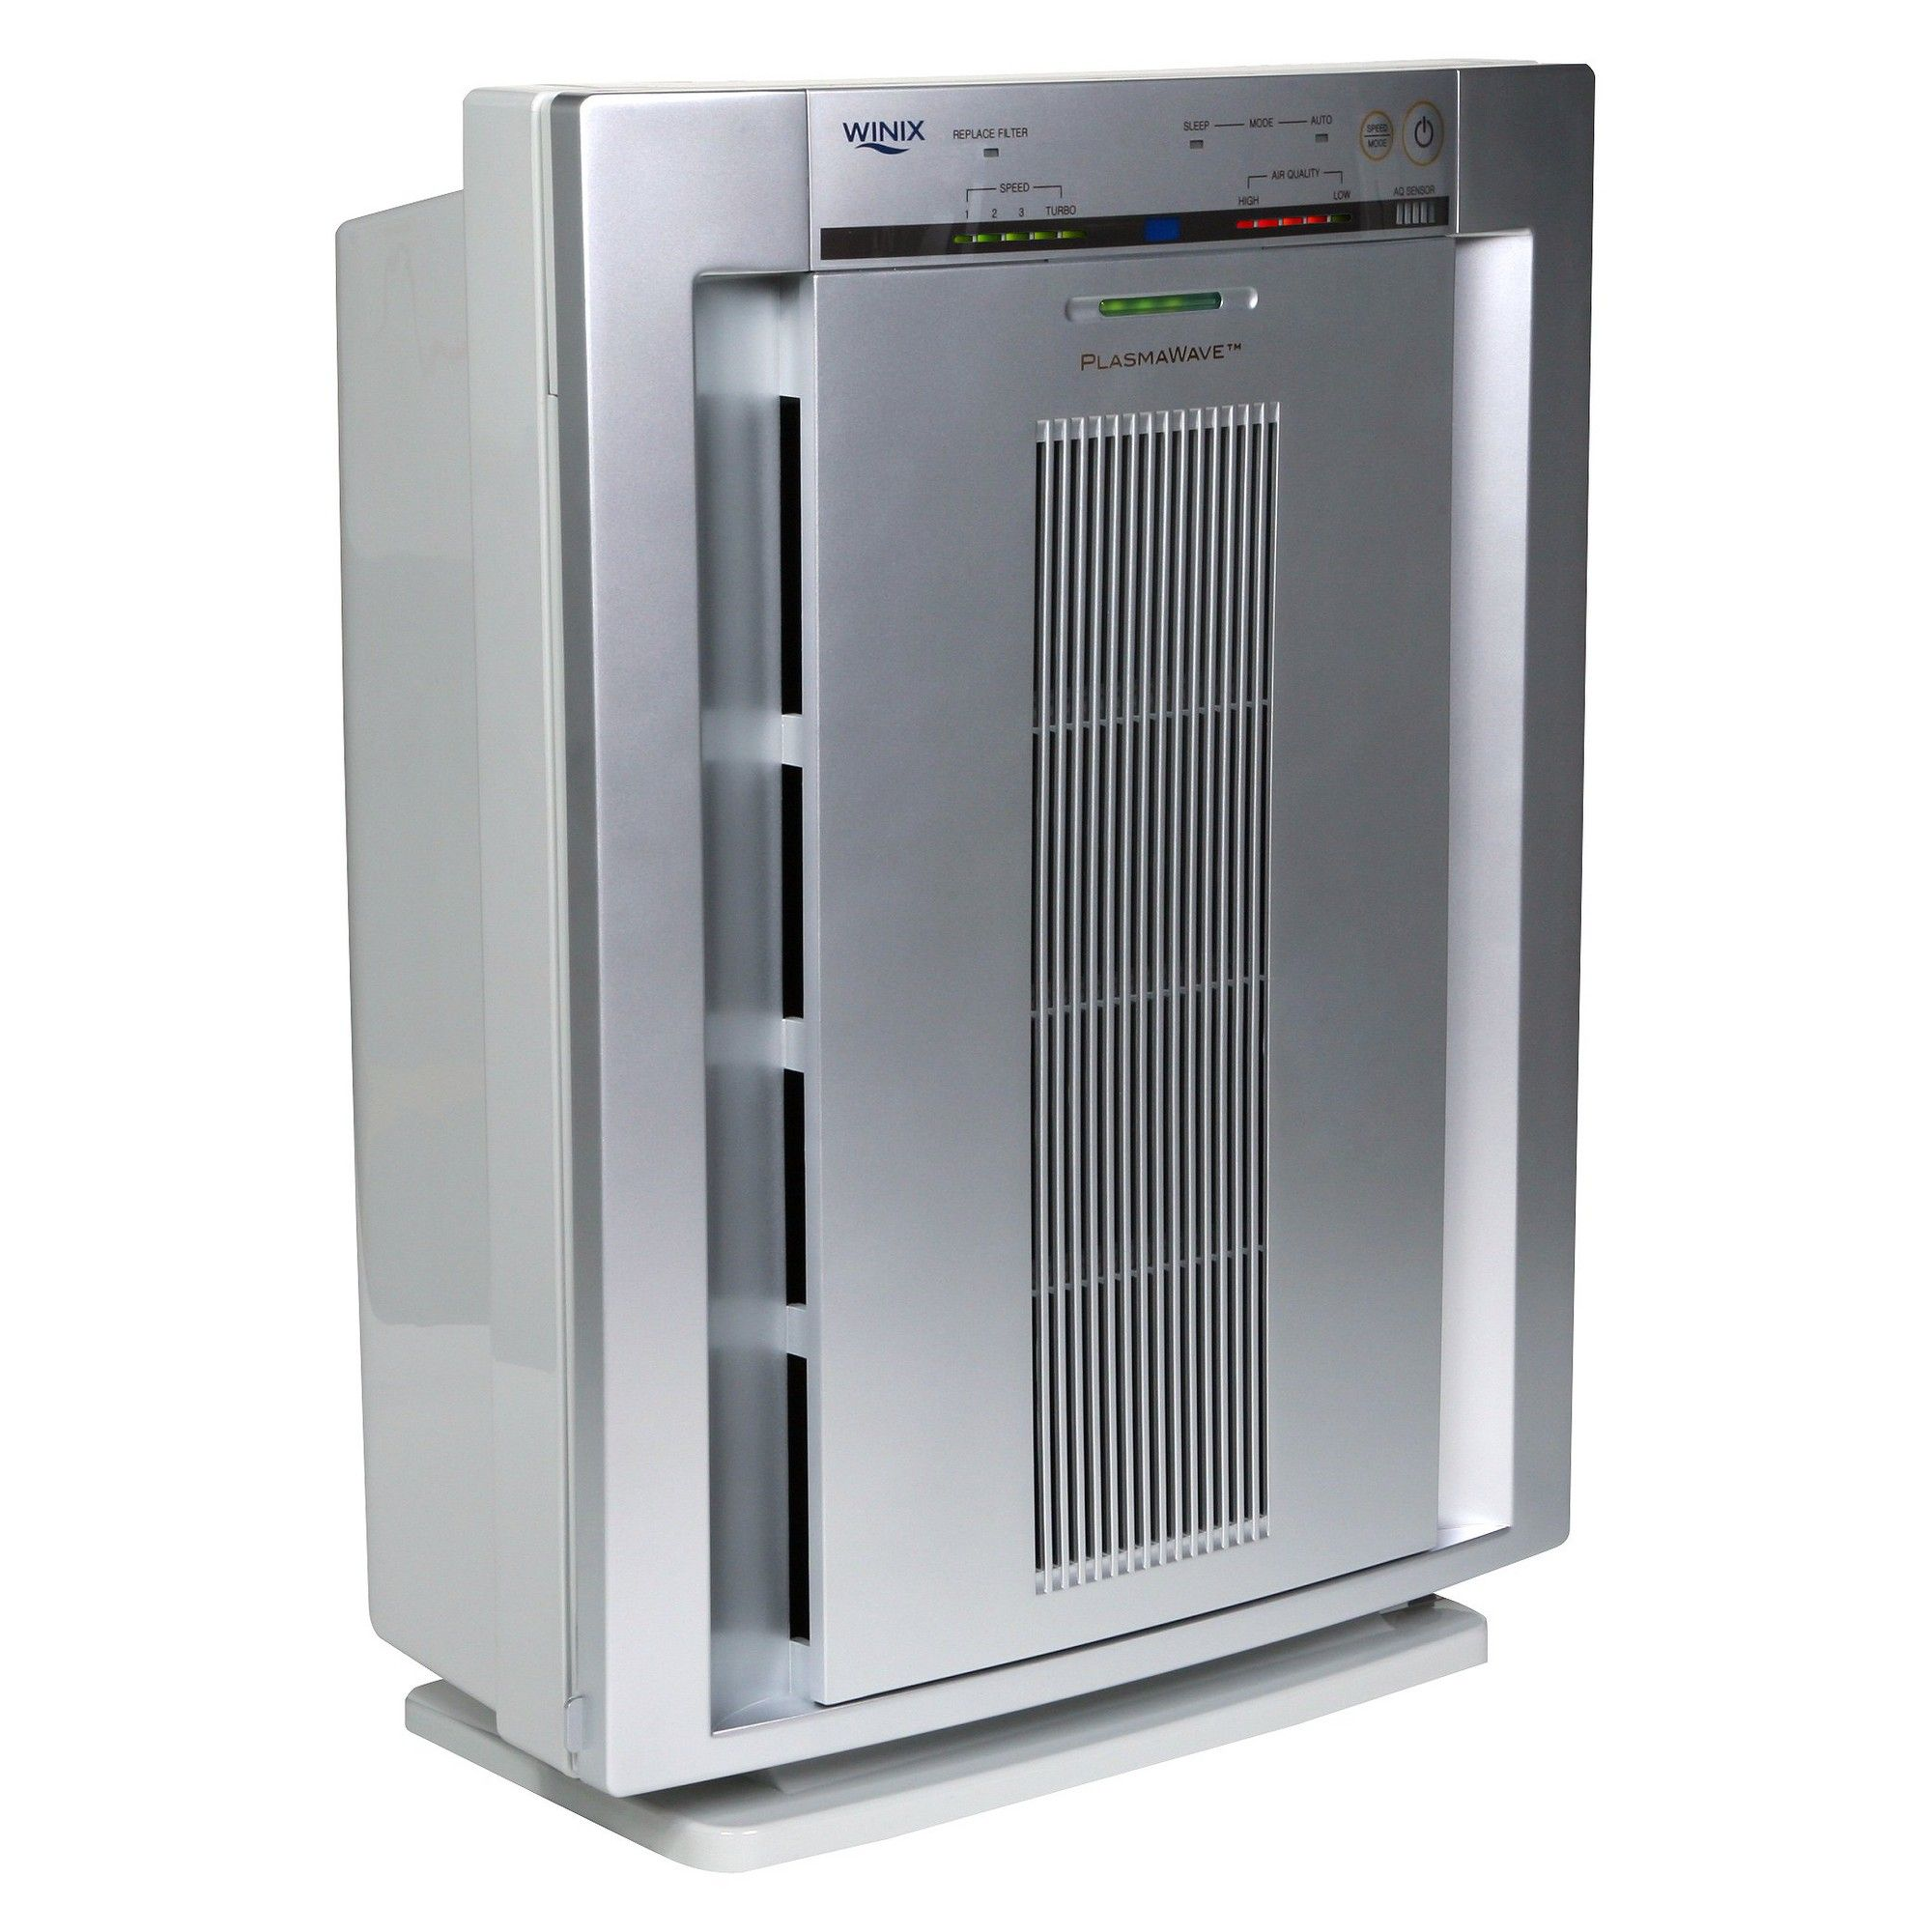 Winix PlasmaWave Air Cleaner 5300 Air purifier, Dust